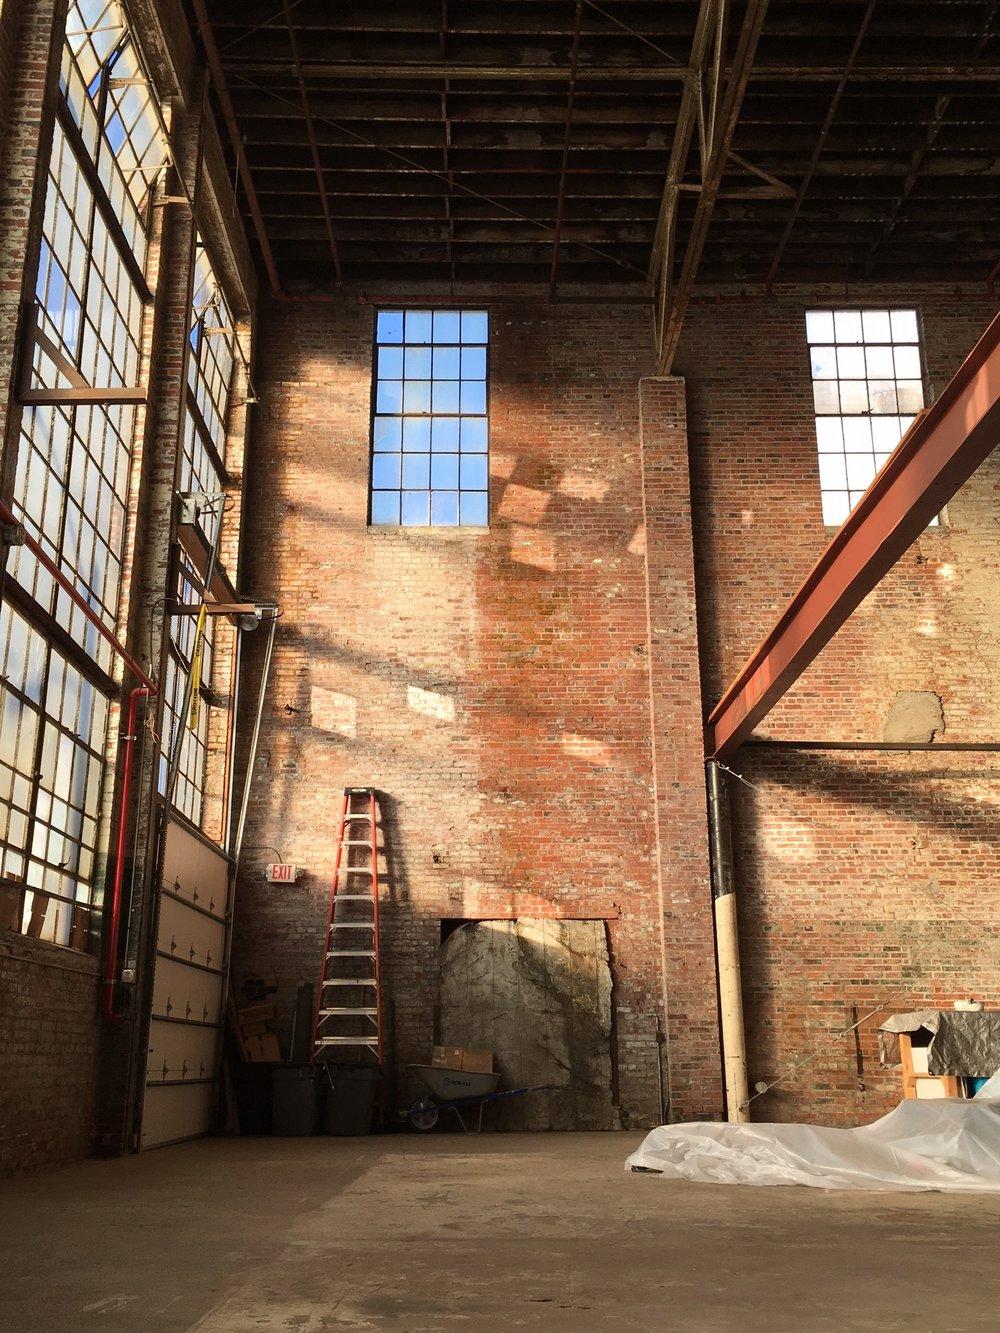 MM Brickhouse Interior South Sunny Wall.JPG